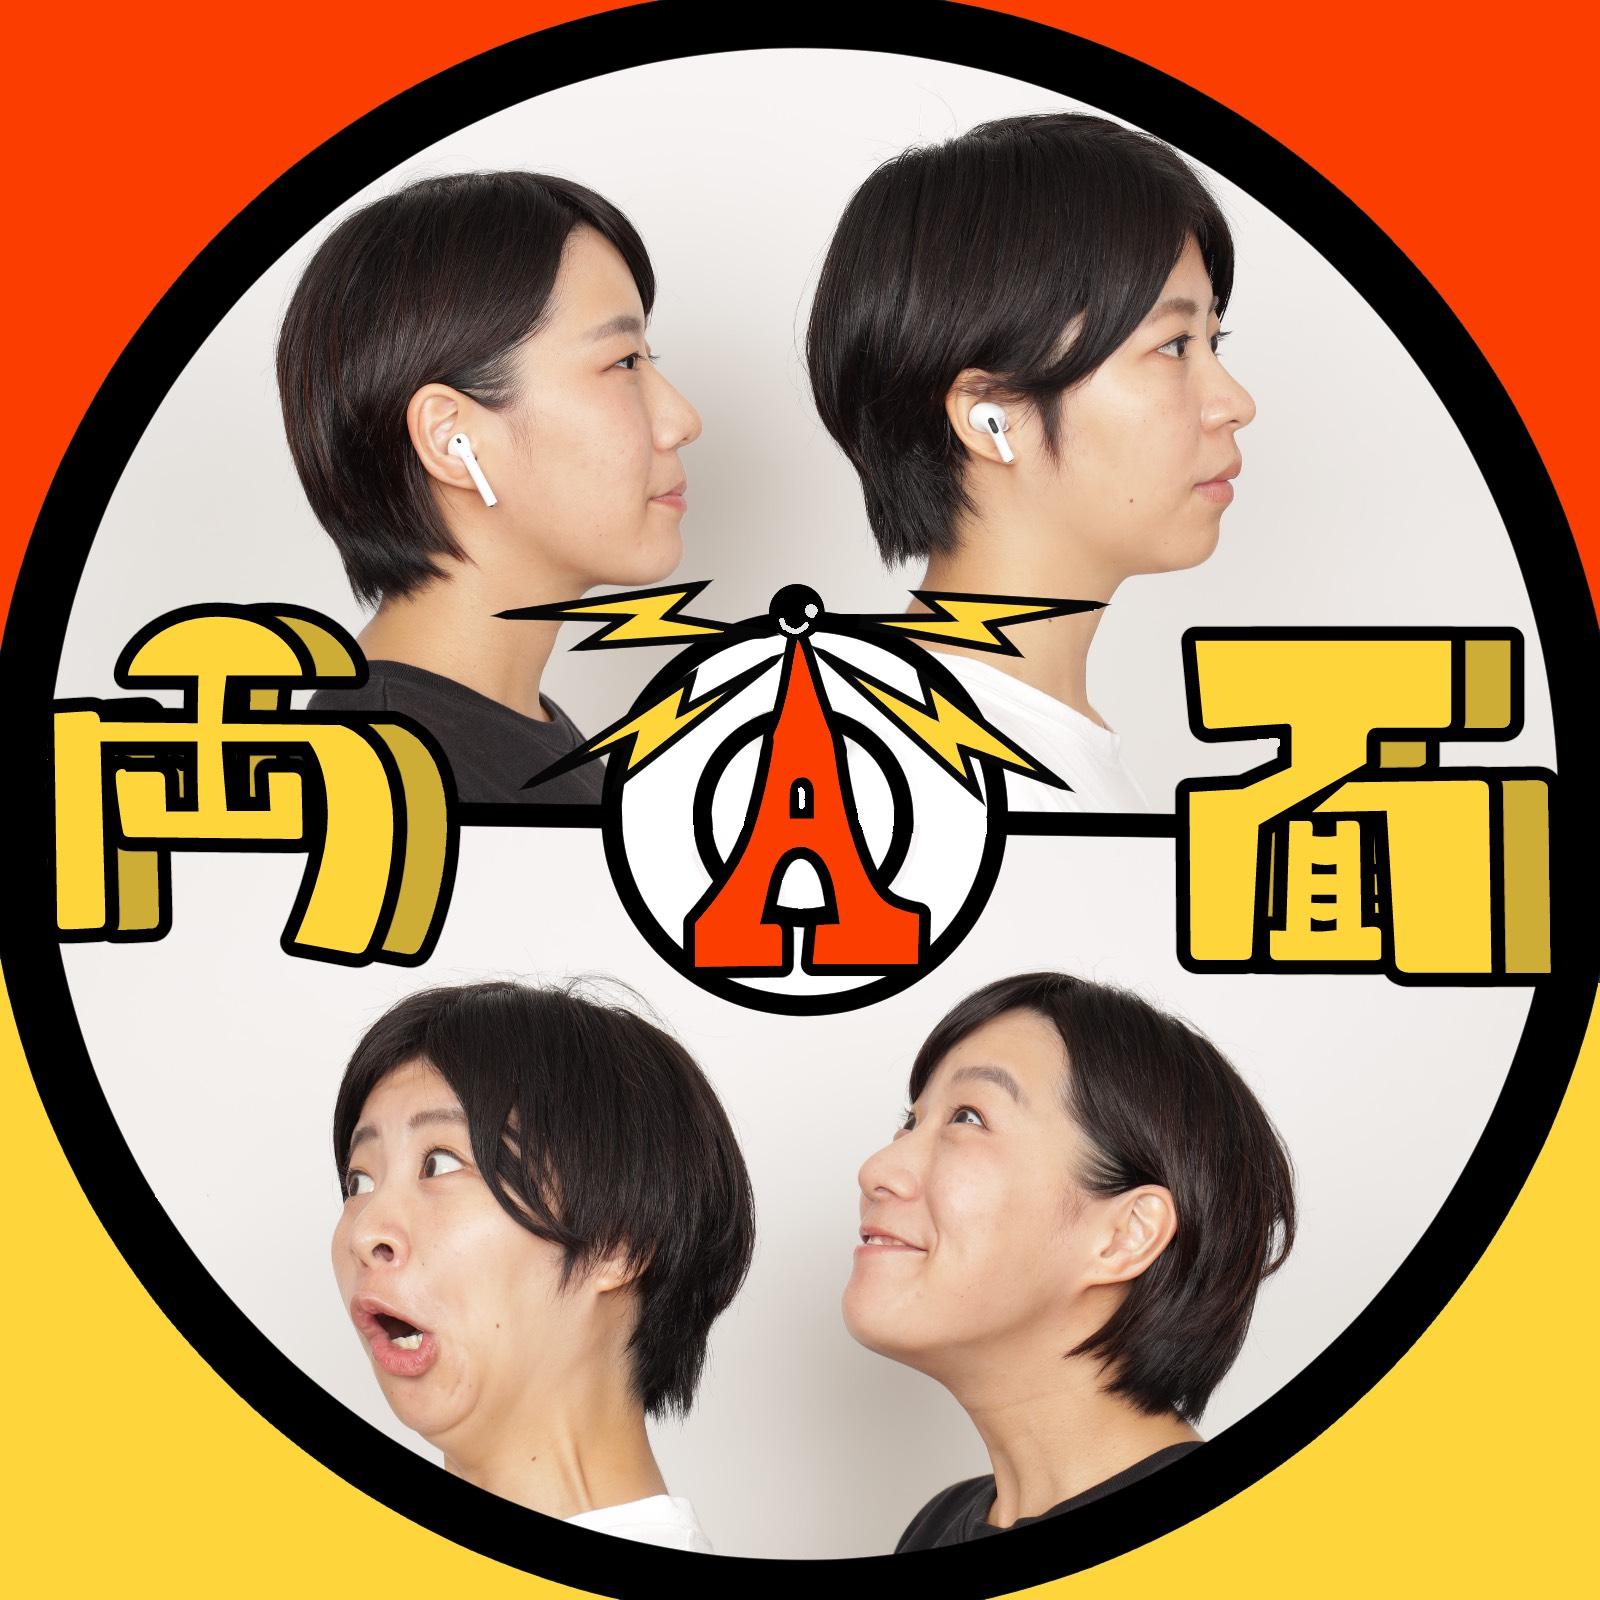 #13 Aマッソ加納と岡田康太